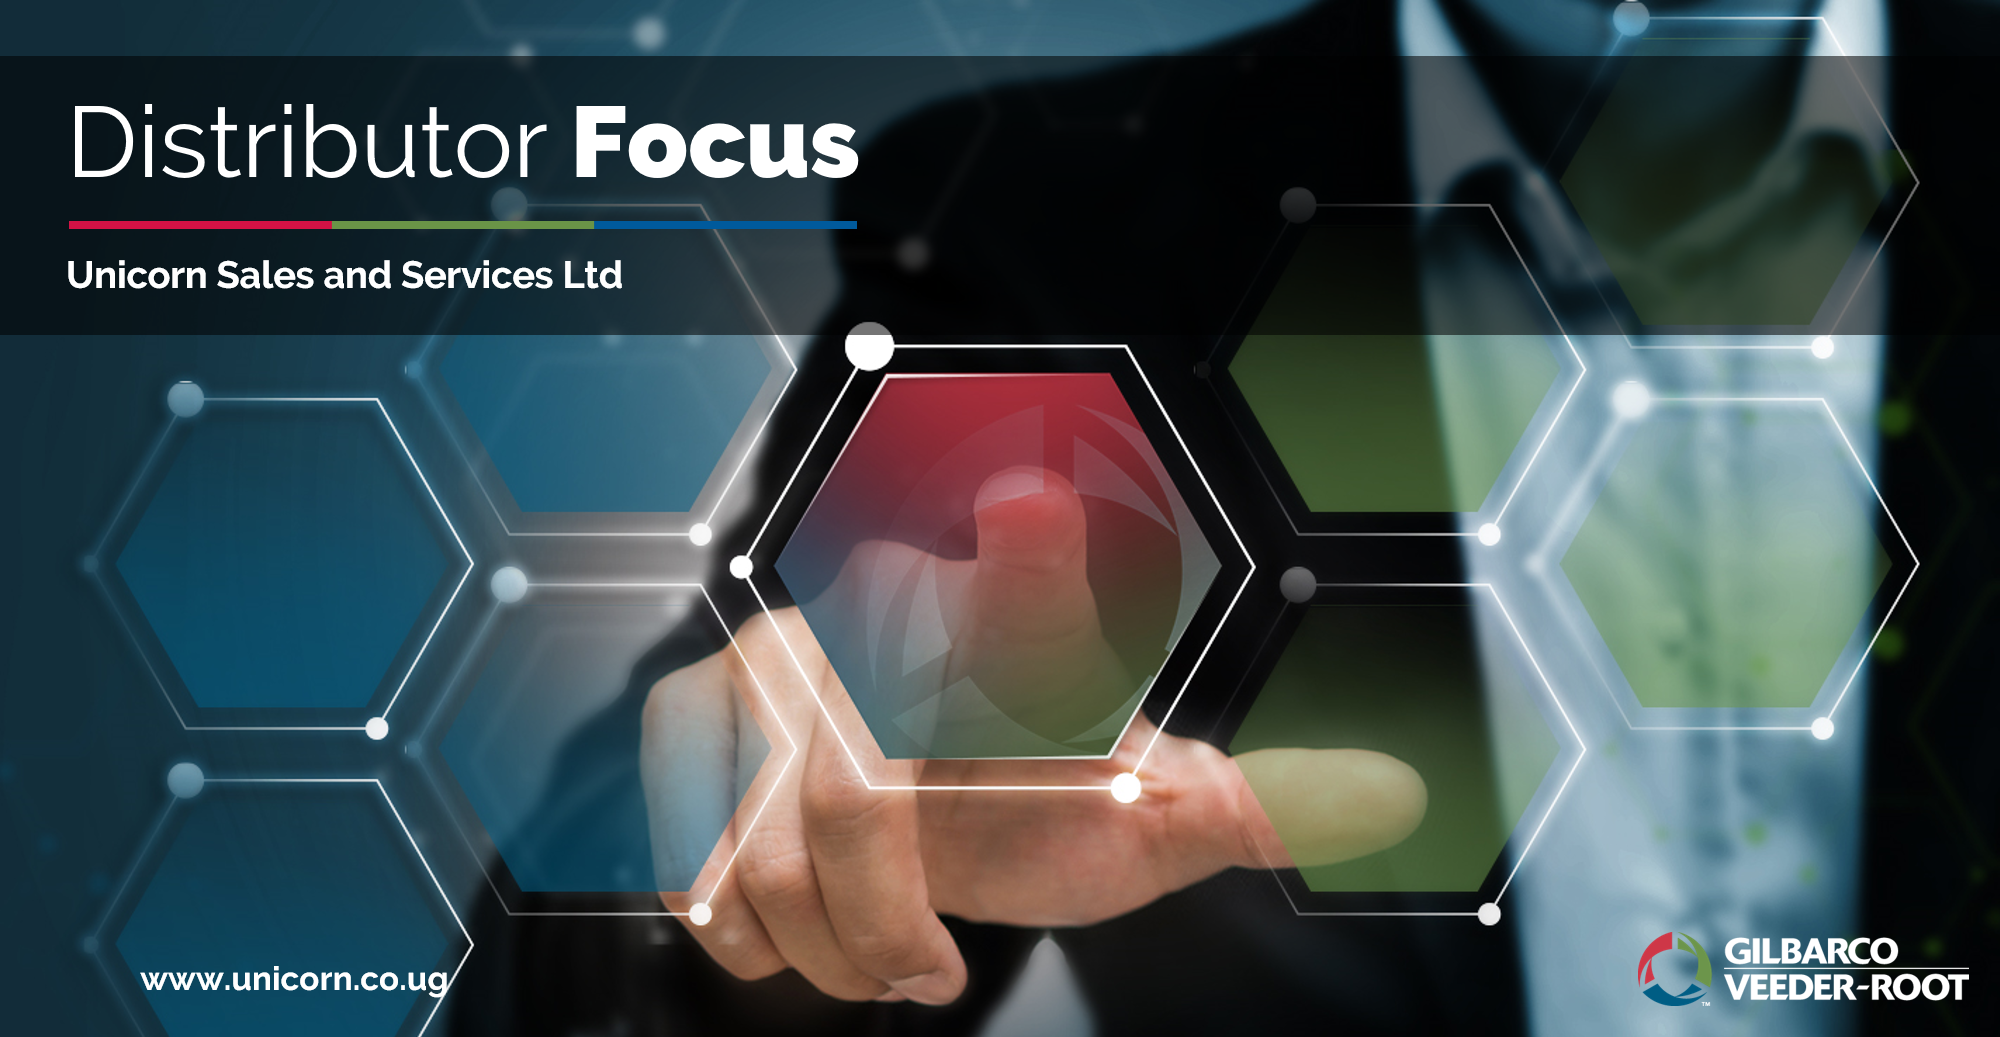 Gilbarco MEA Distributor Focus Unicorn Sales and Service